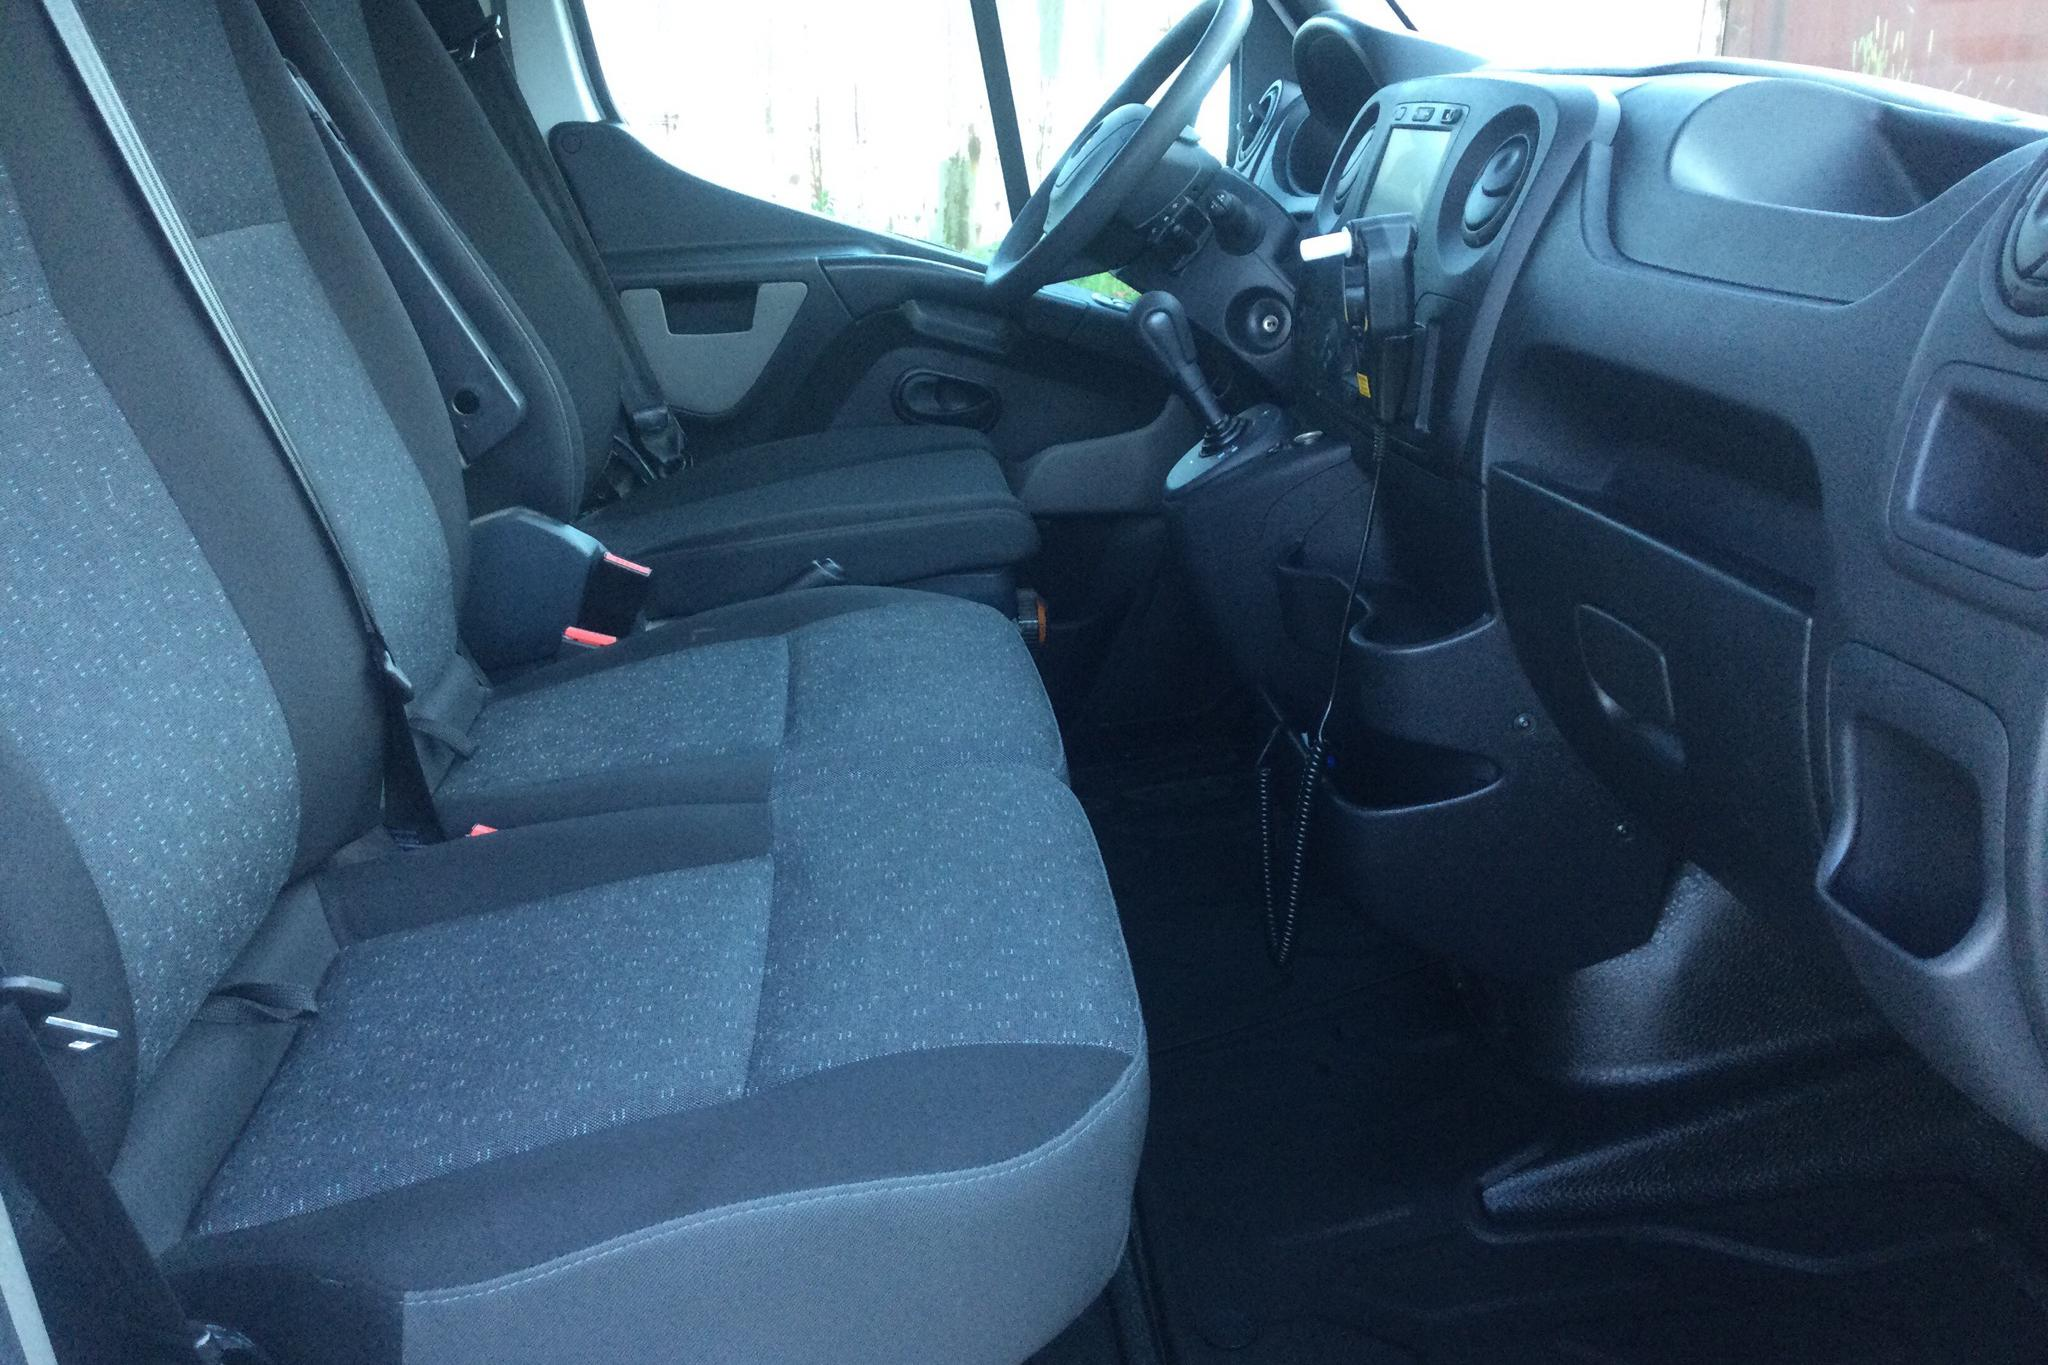 Opel Movano 2.3 CDTI RWD Skåp (170hk) - 147 280 km - Automatic - white - 2018